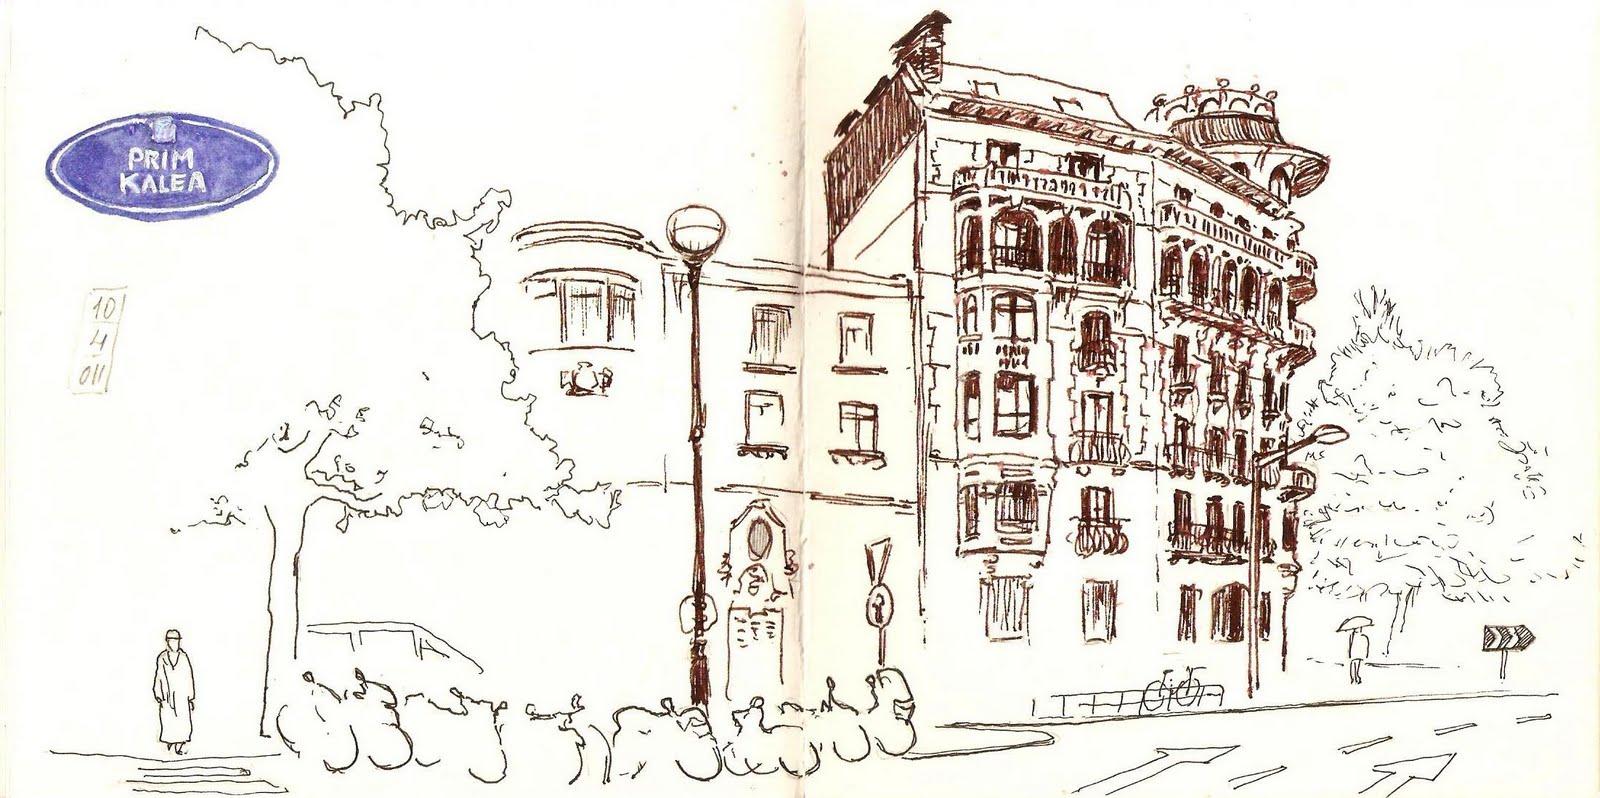 Calle Prim .Donostia.Dibujo. Joaquín Aragón.